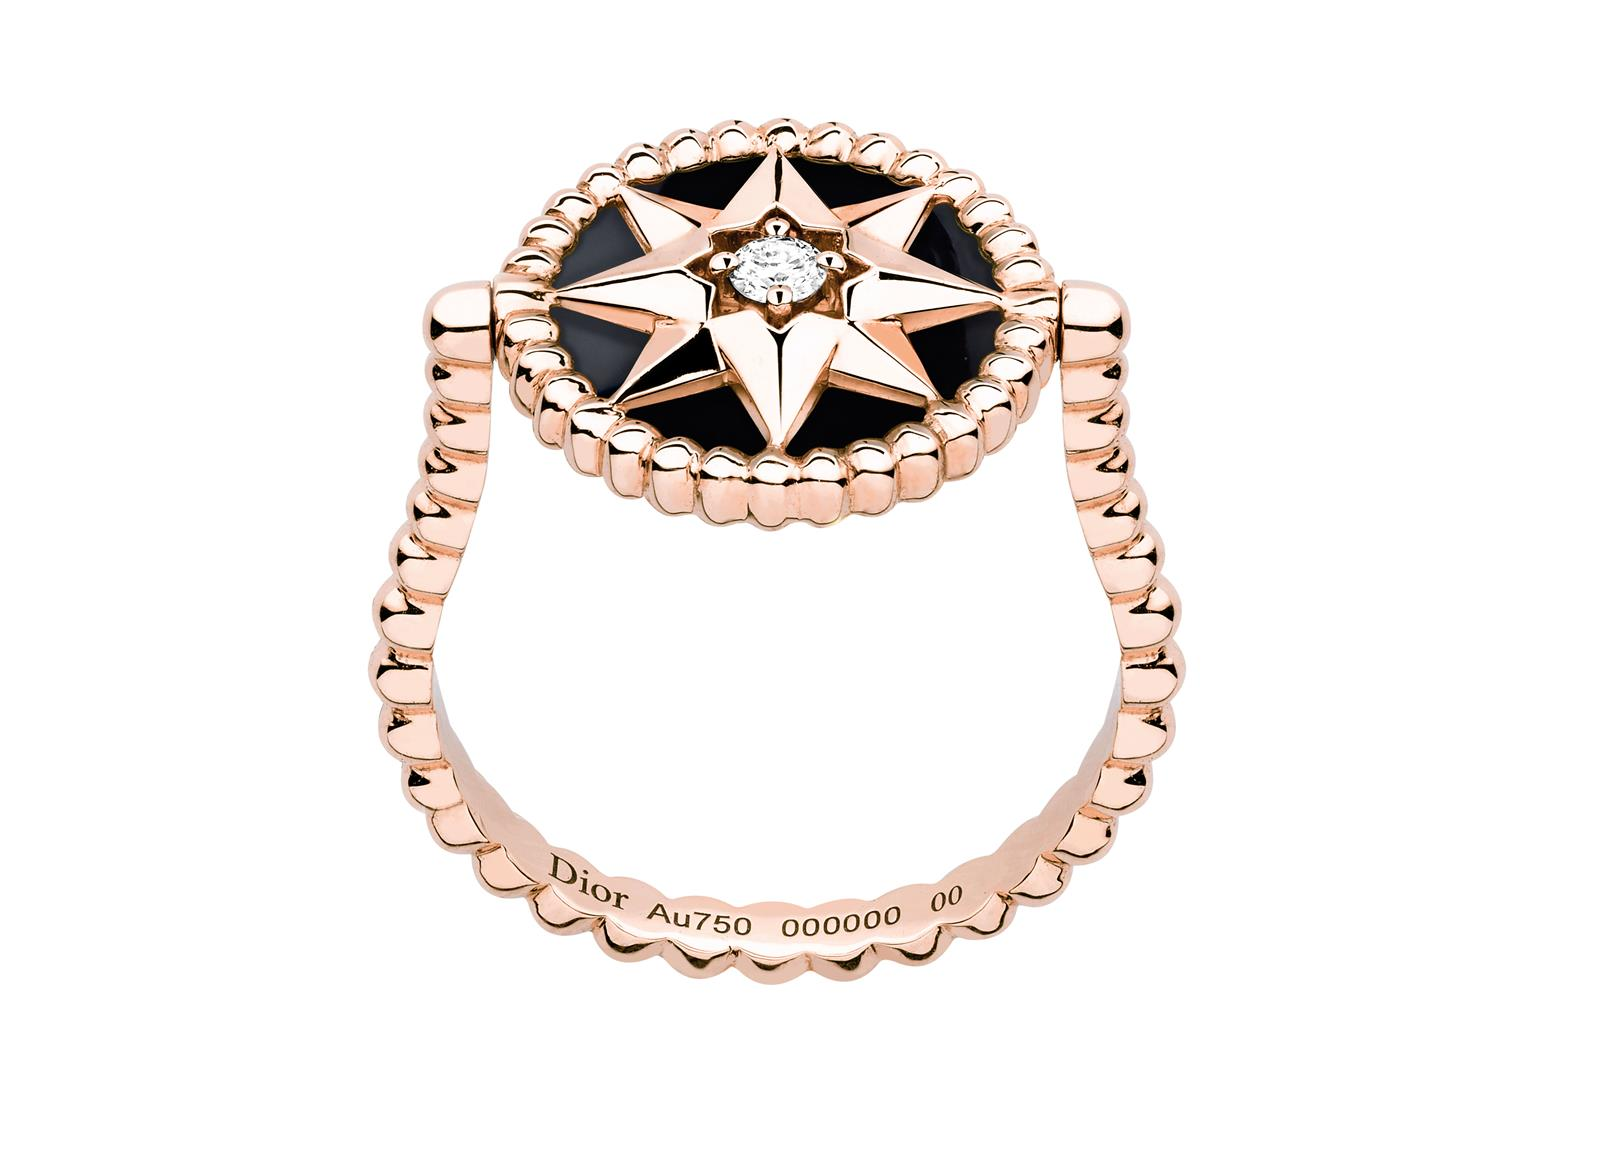 jewellery_JRDV95043_1 (Copy)